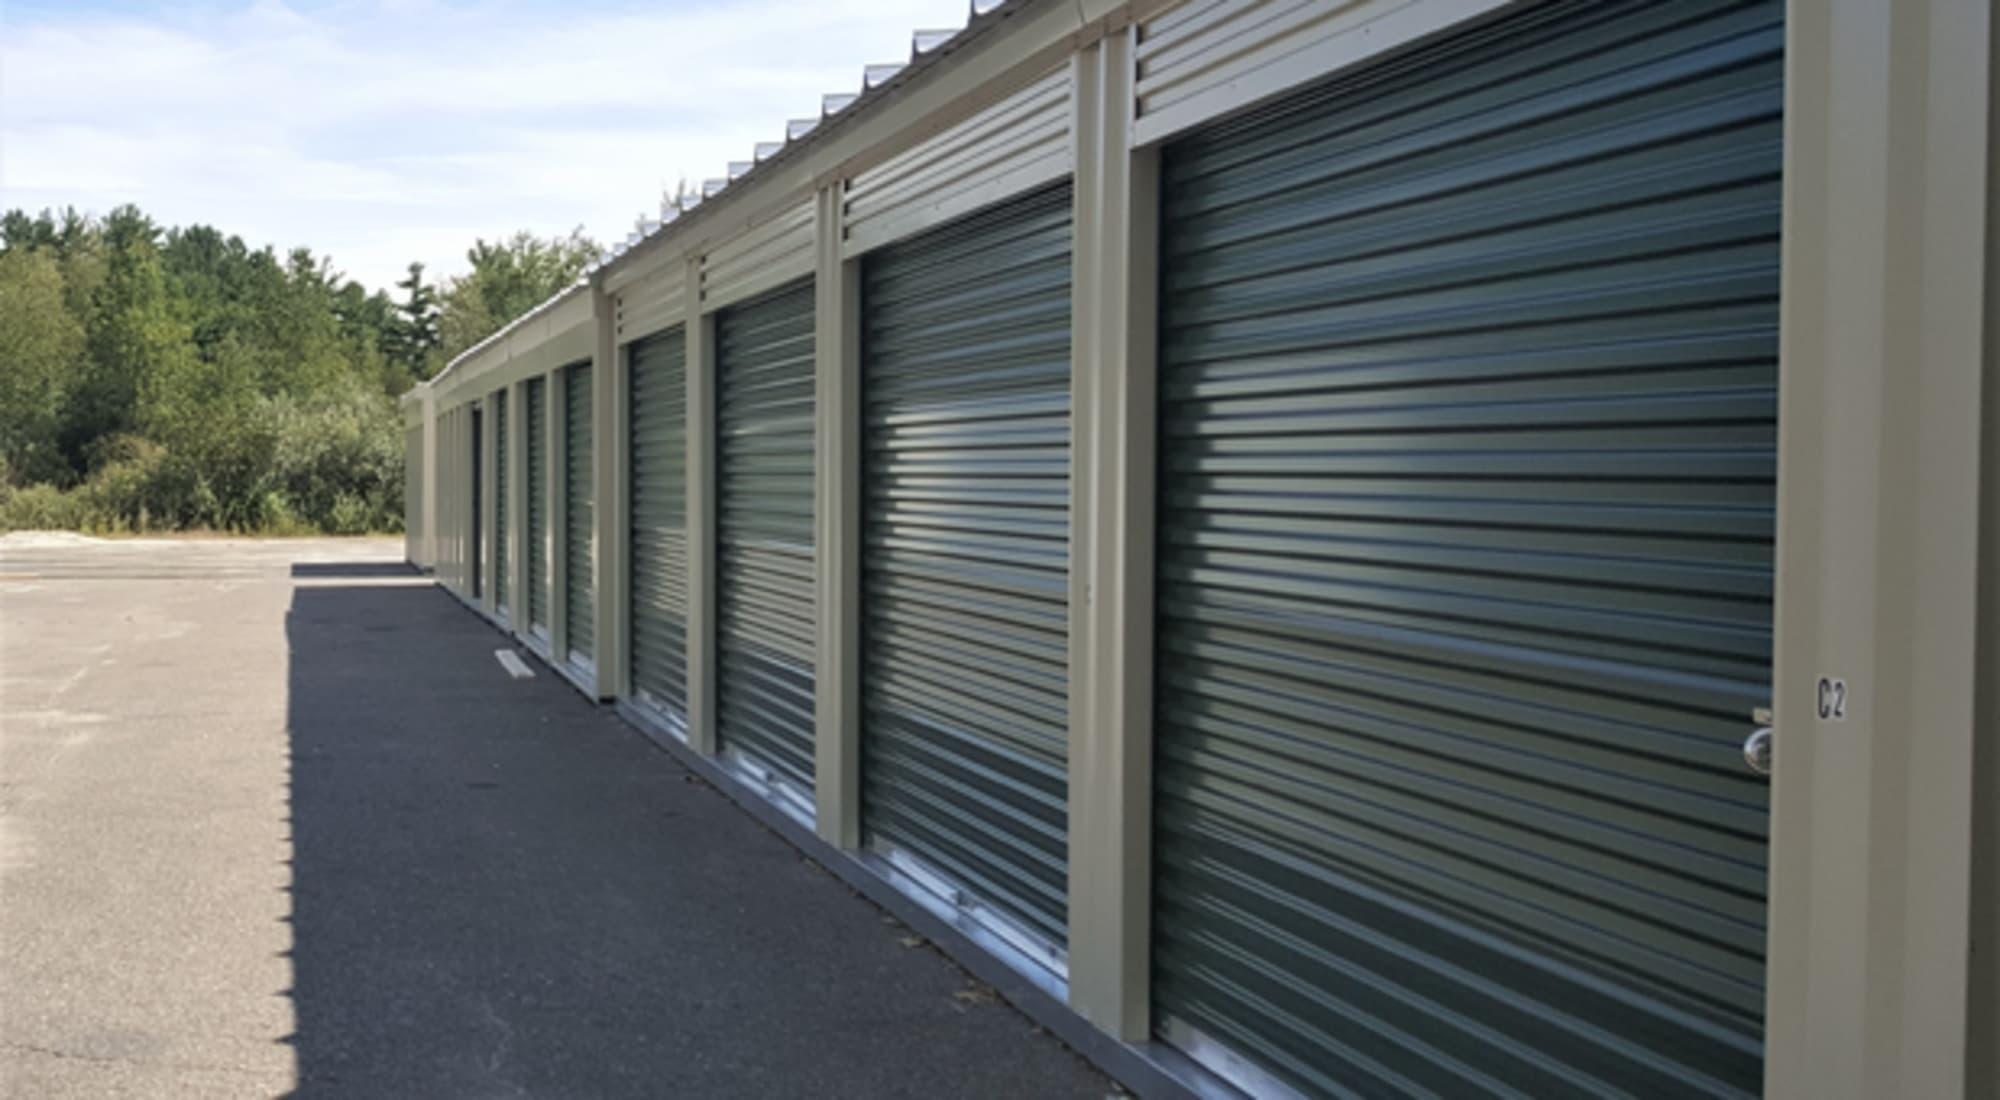 603 Storage - Route 27 self storage in Raymond, New Hampshire